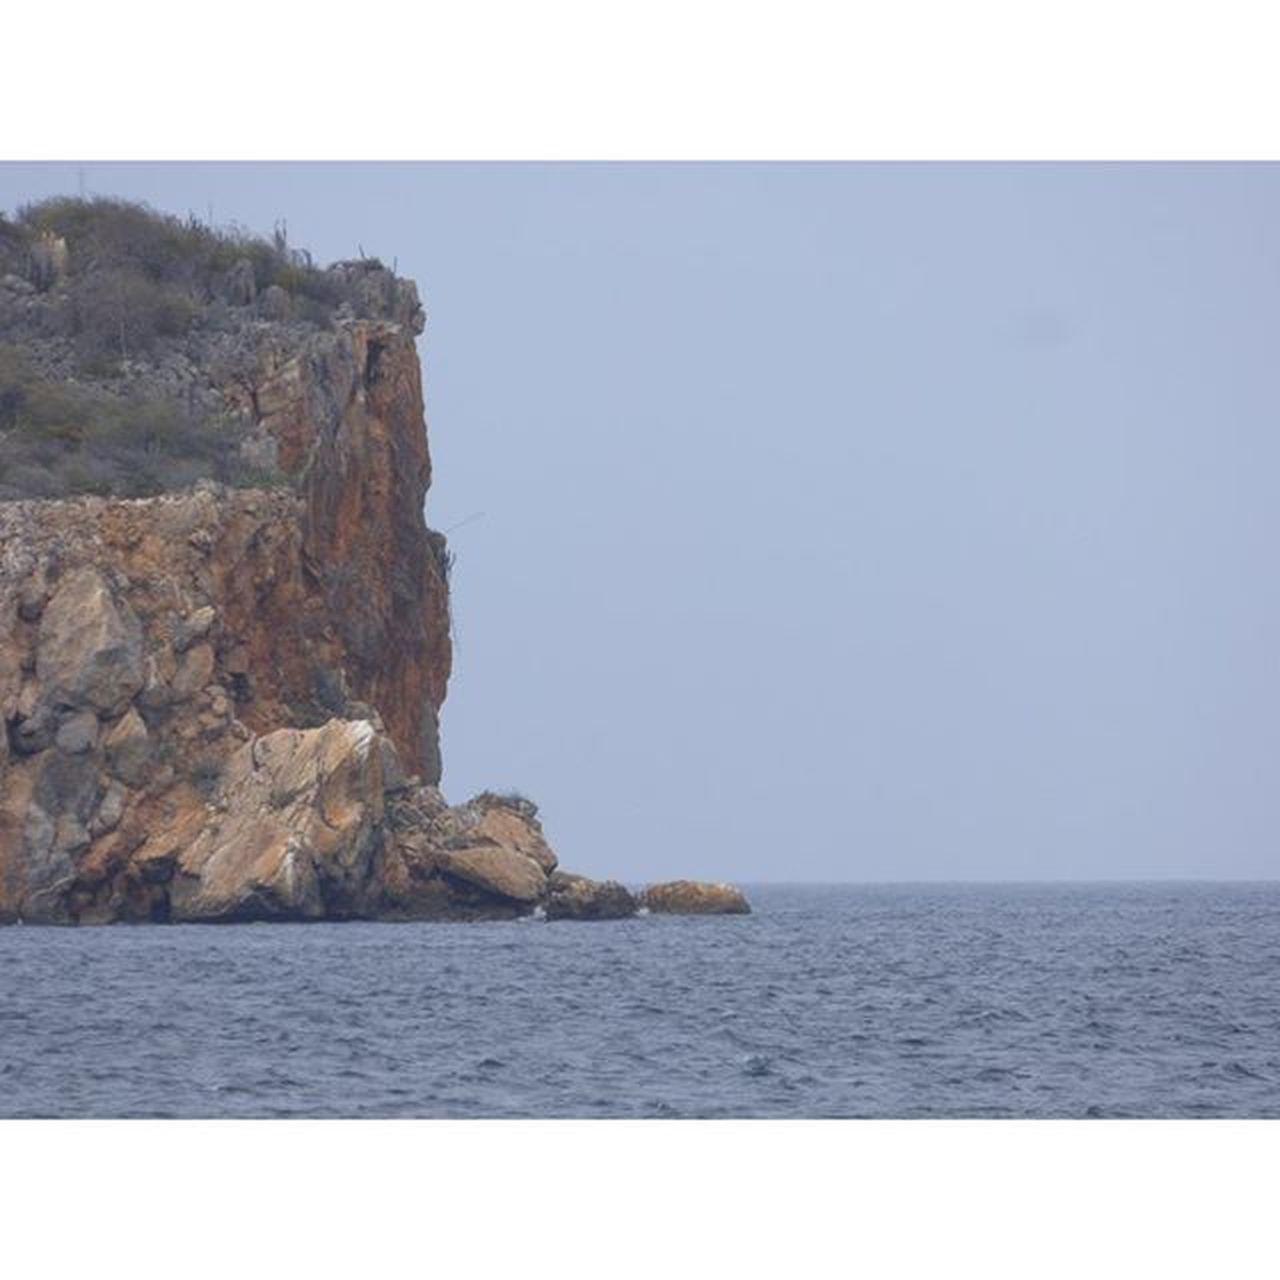 2016 Viajandoconcedula Vacation Venezuela Mochima Sea Mountains Found On The Roll